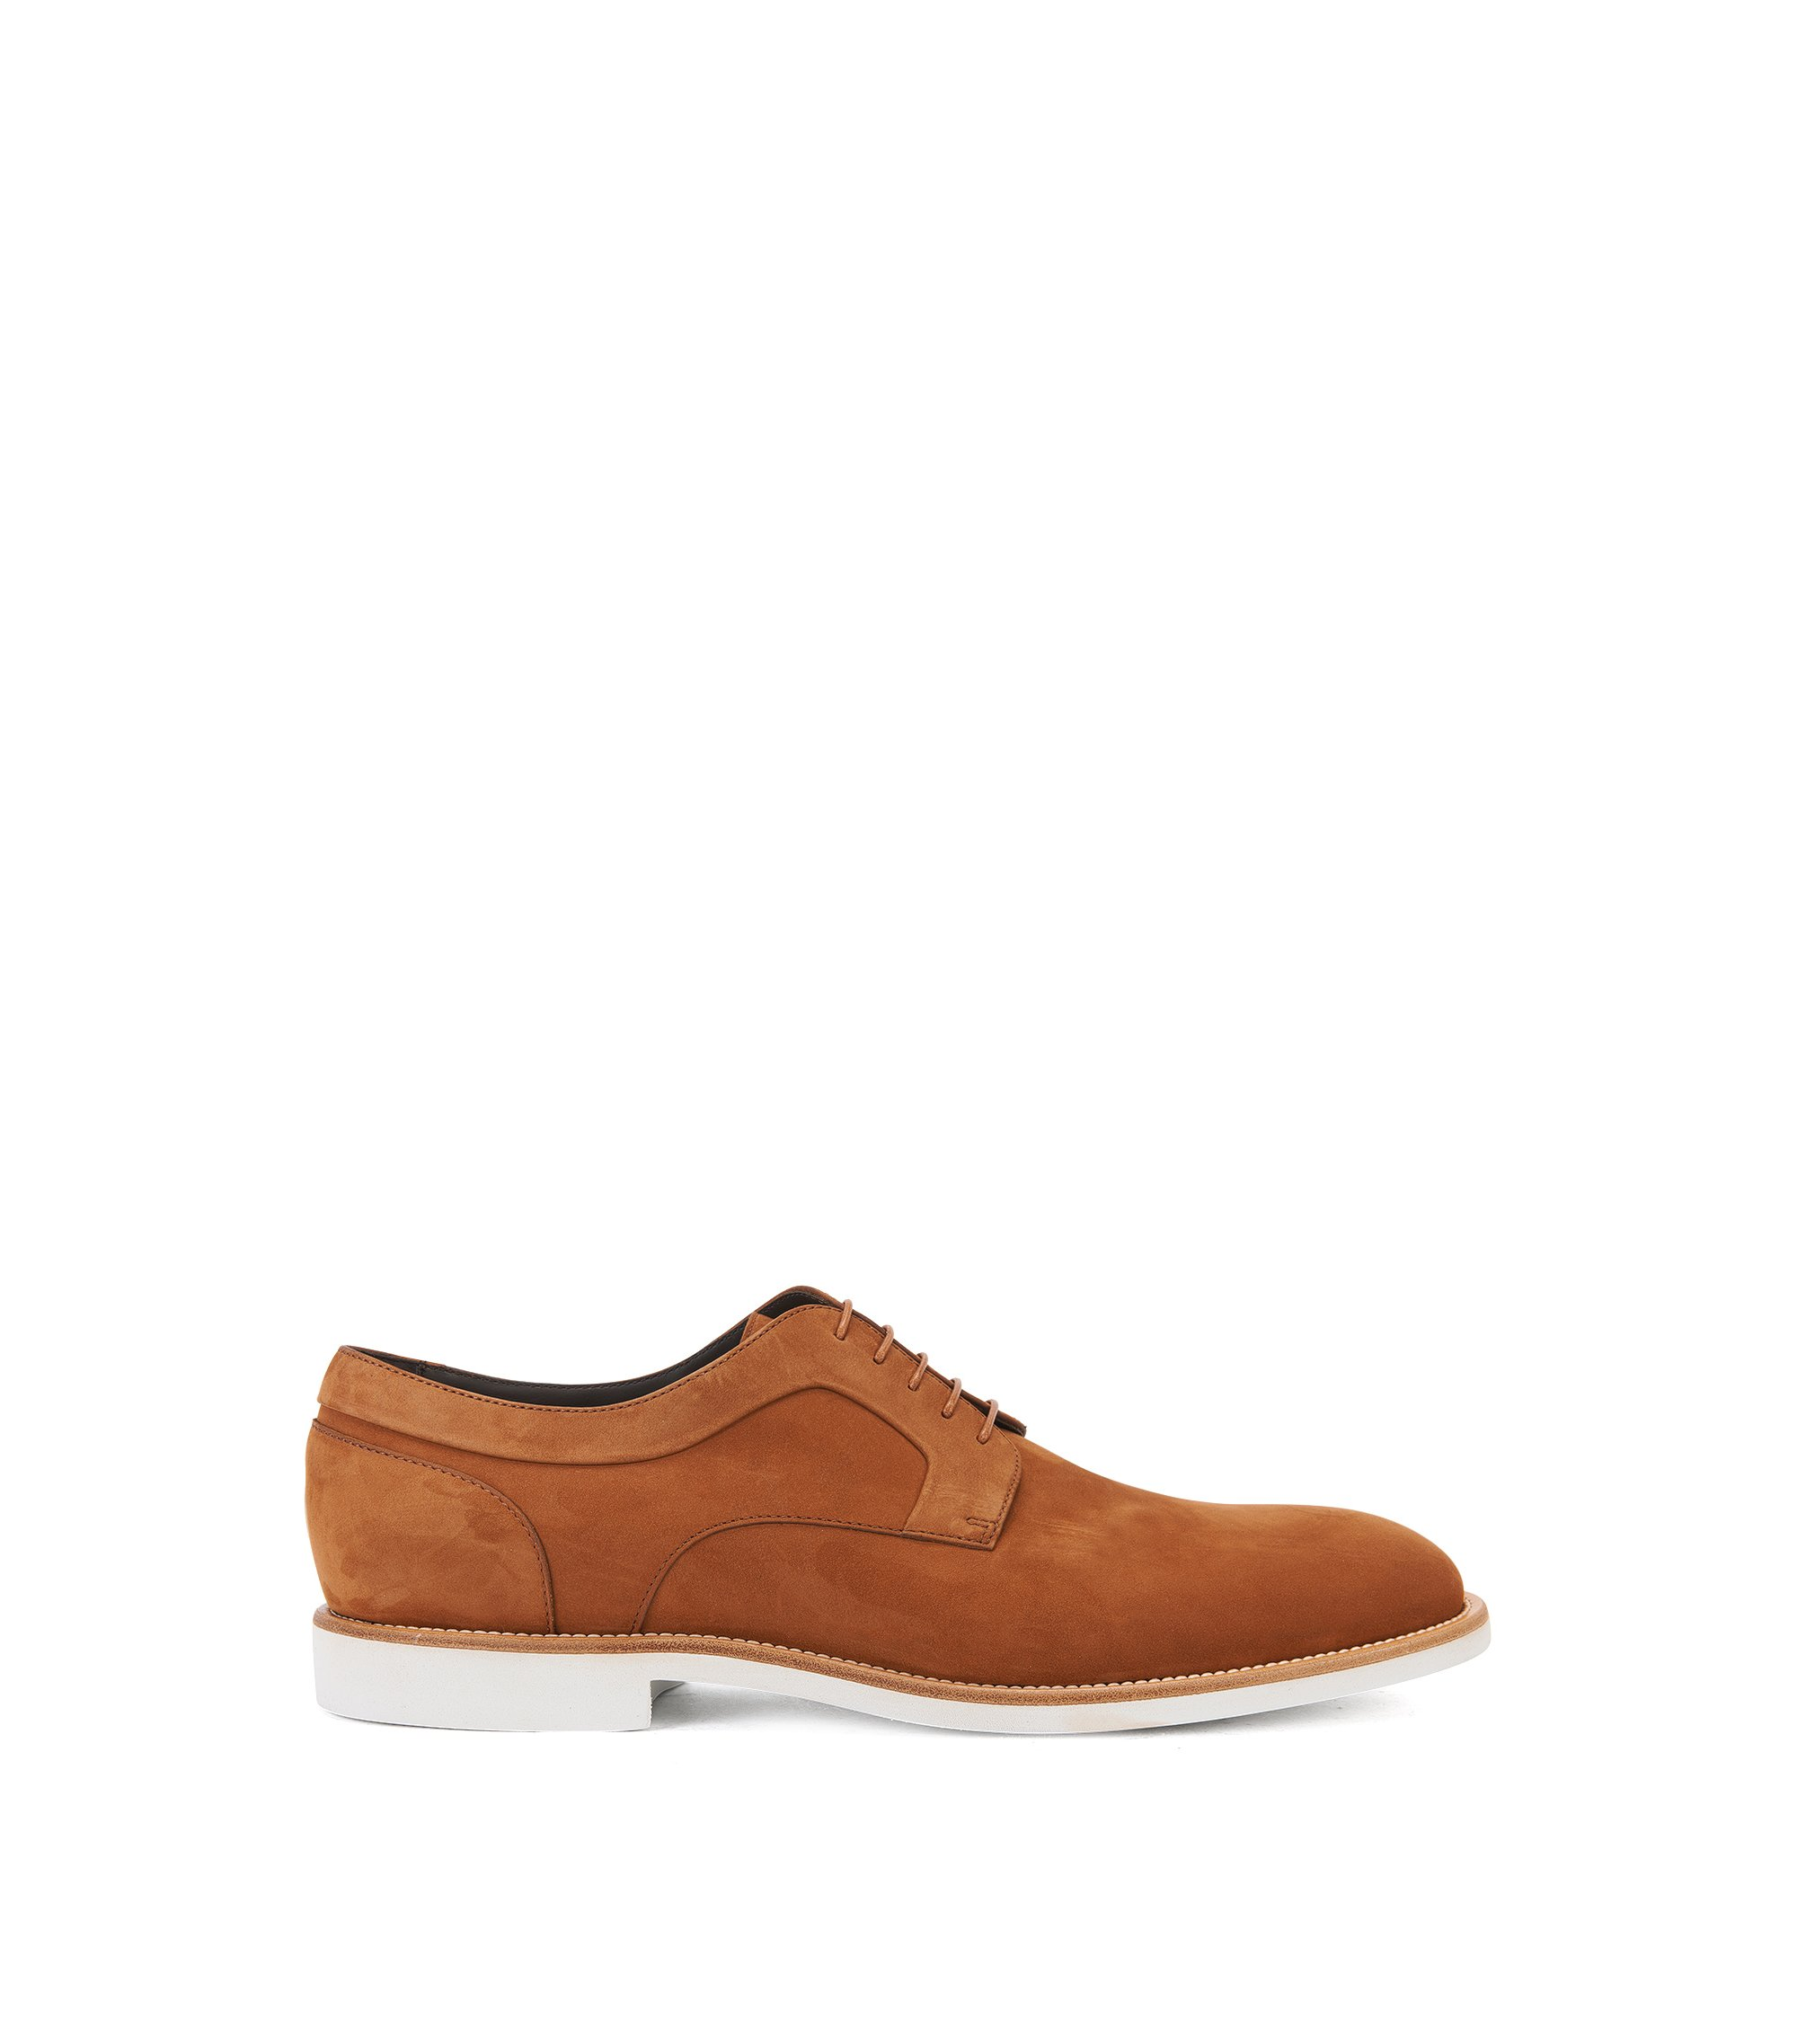 Italian Nubuck Derby Shoe | Ocean Derb Nu, Brown